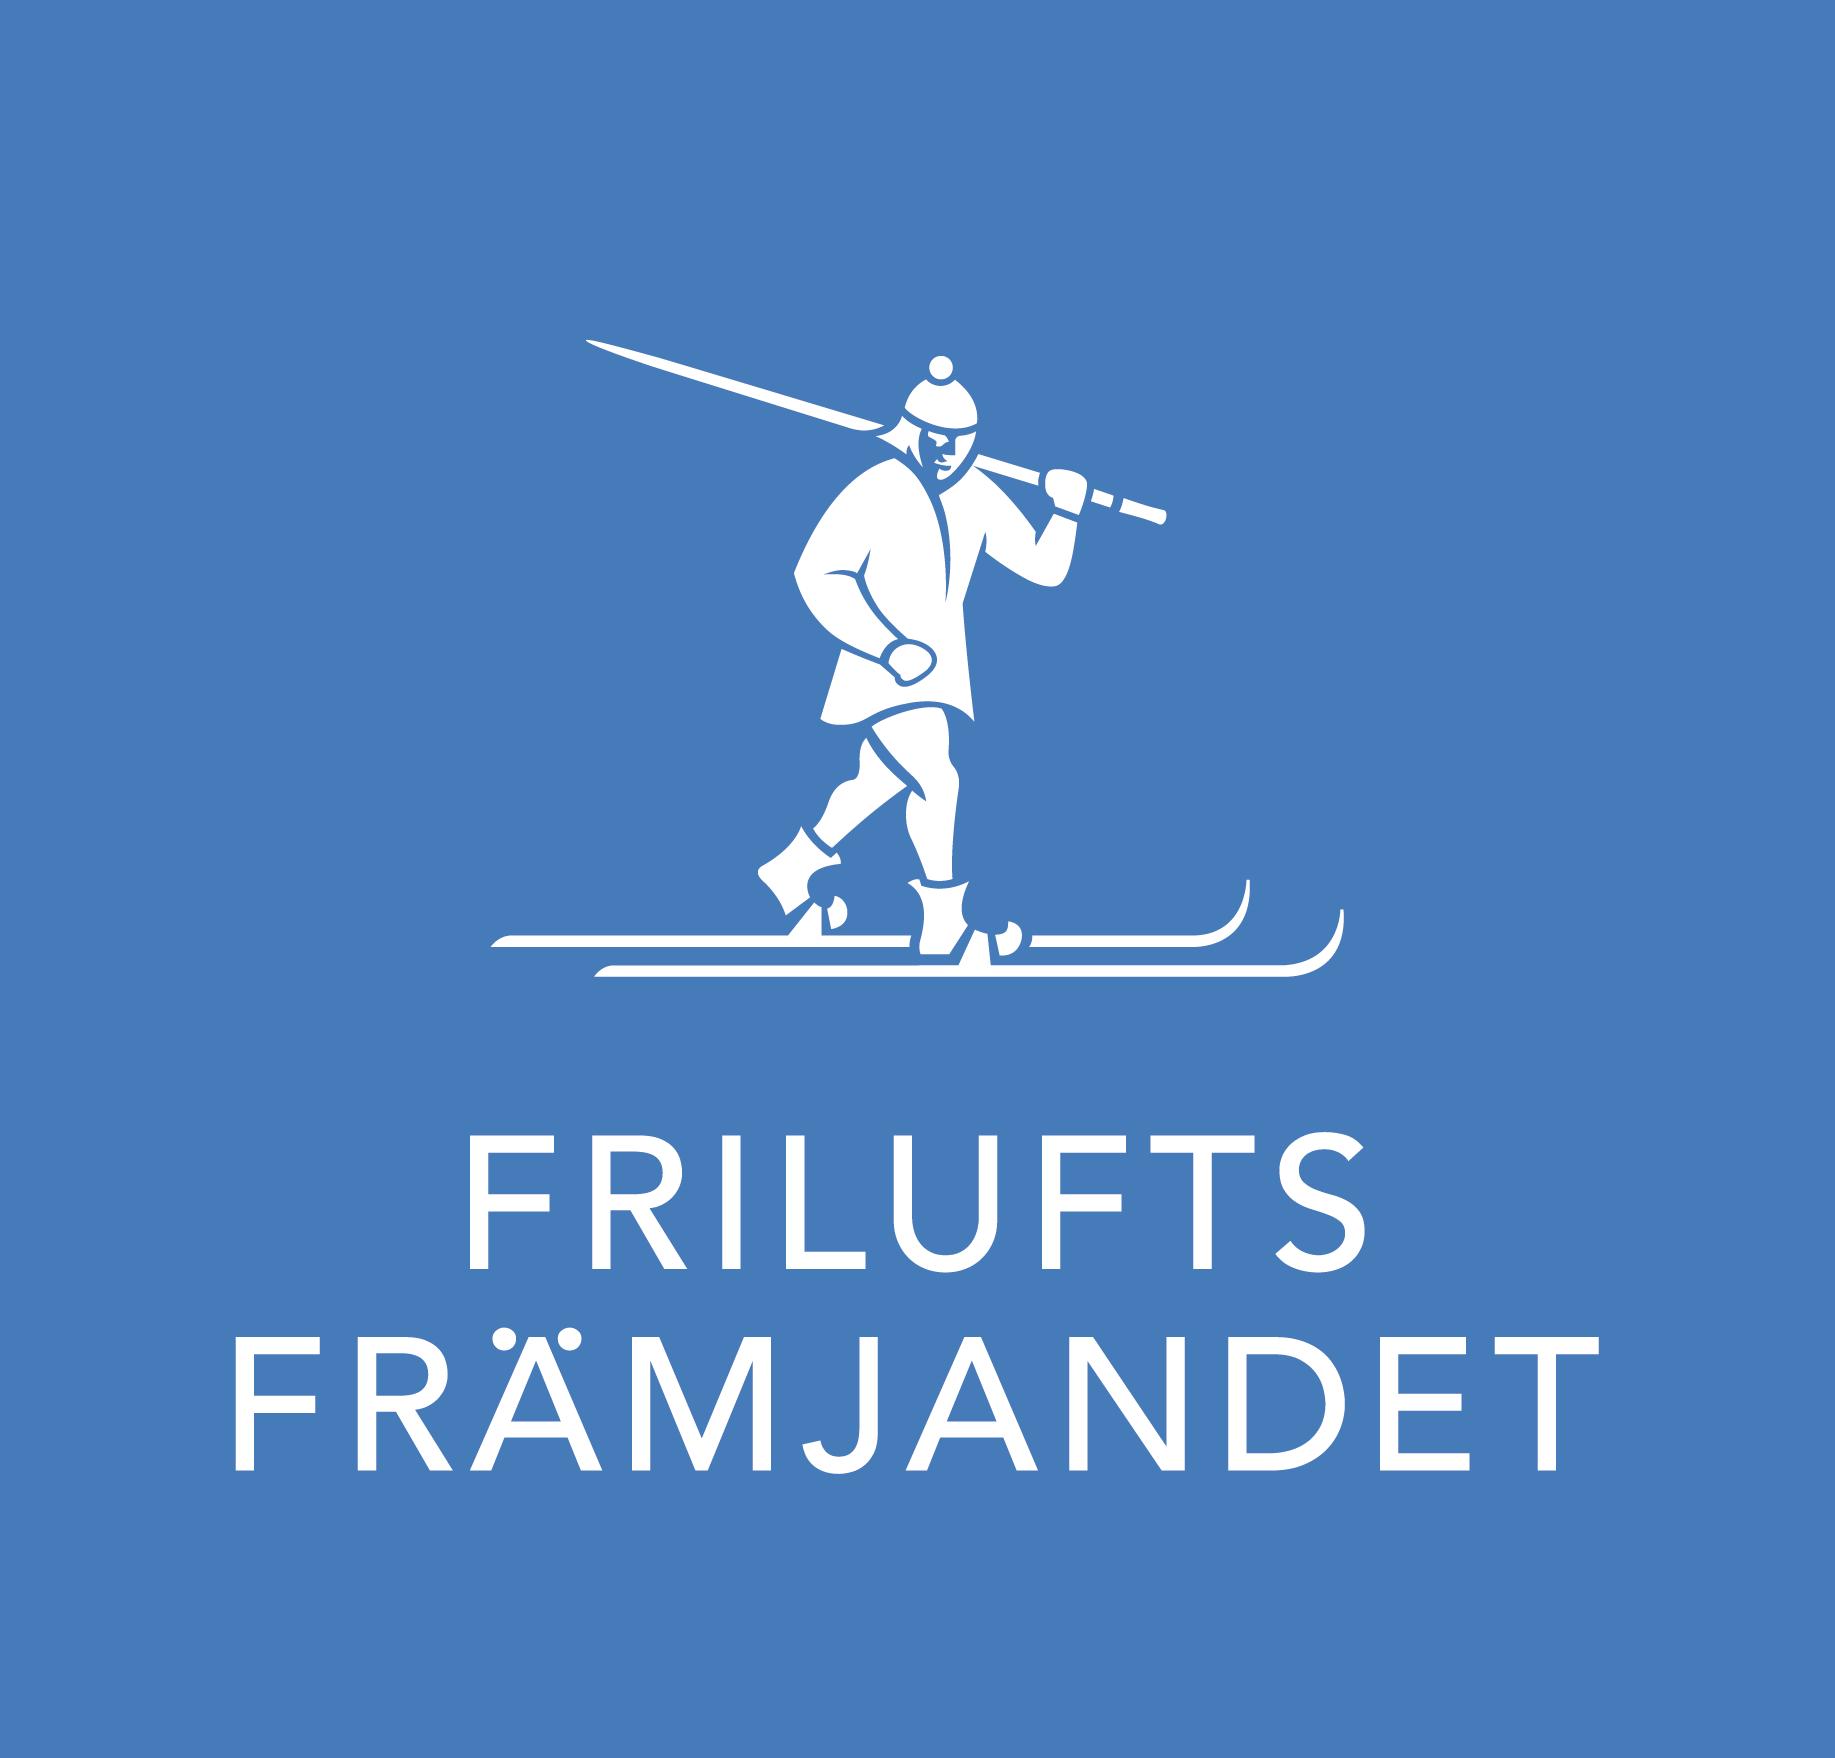 Friluftsfrämjandets logo. Blå fyrkant med en vit illustration av en man på skidor.